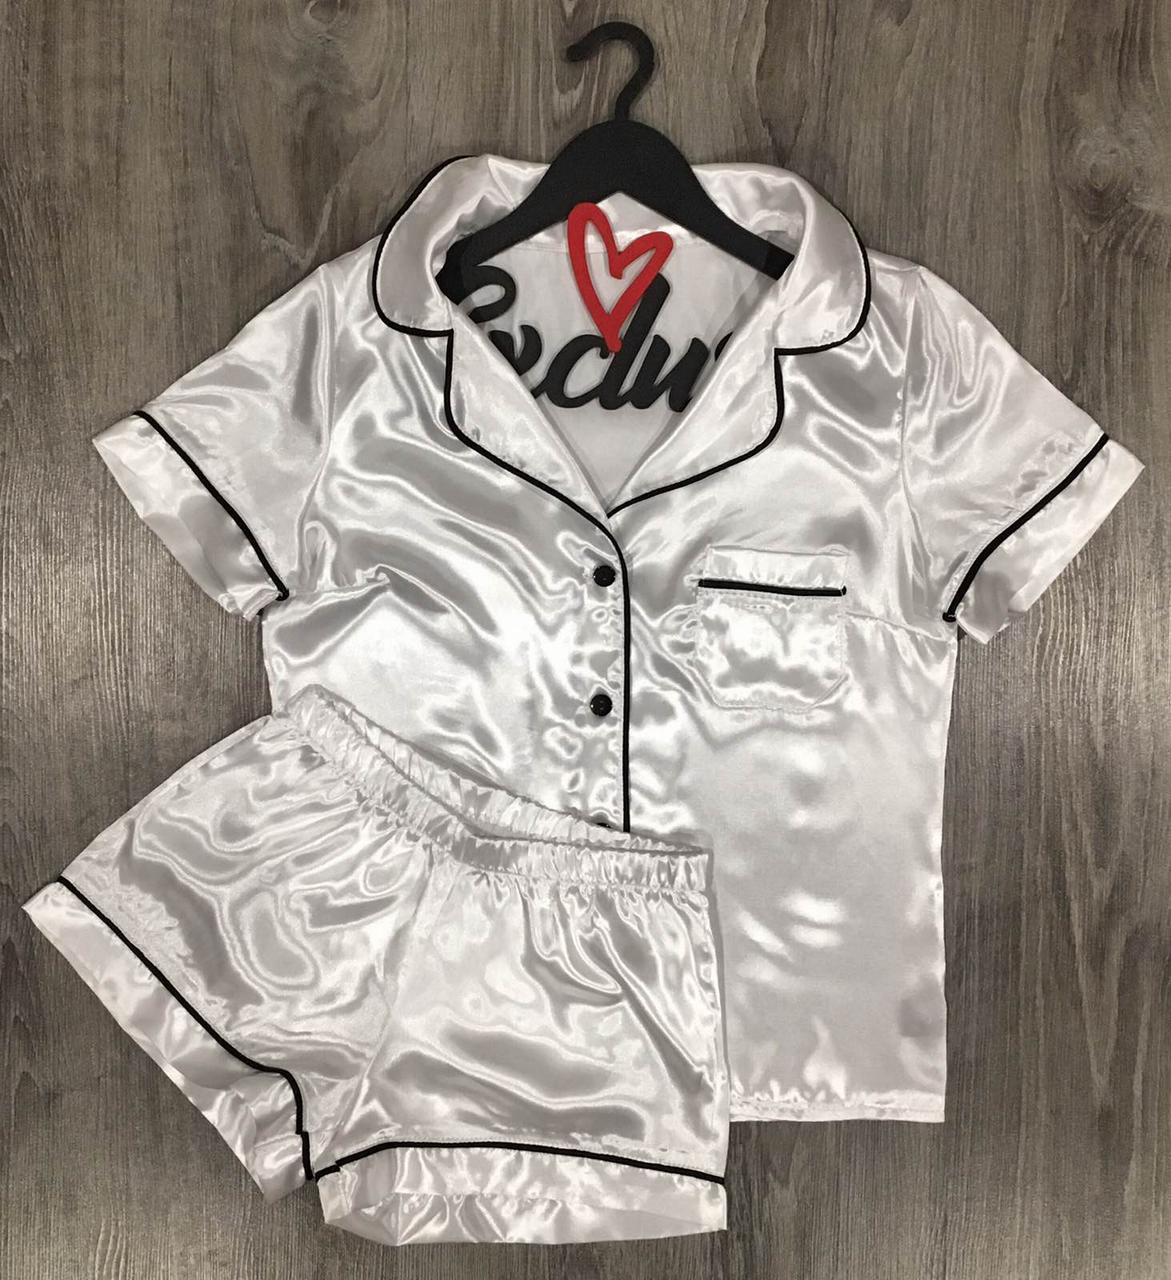 Белый комплект пижамы: шорты и рубашка из атласа